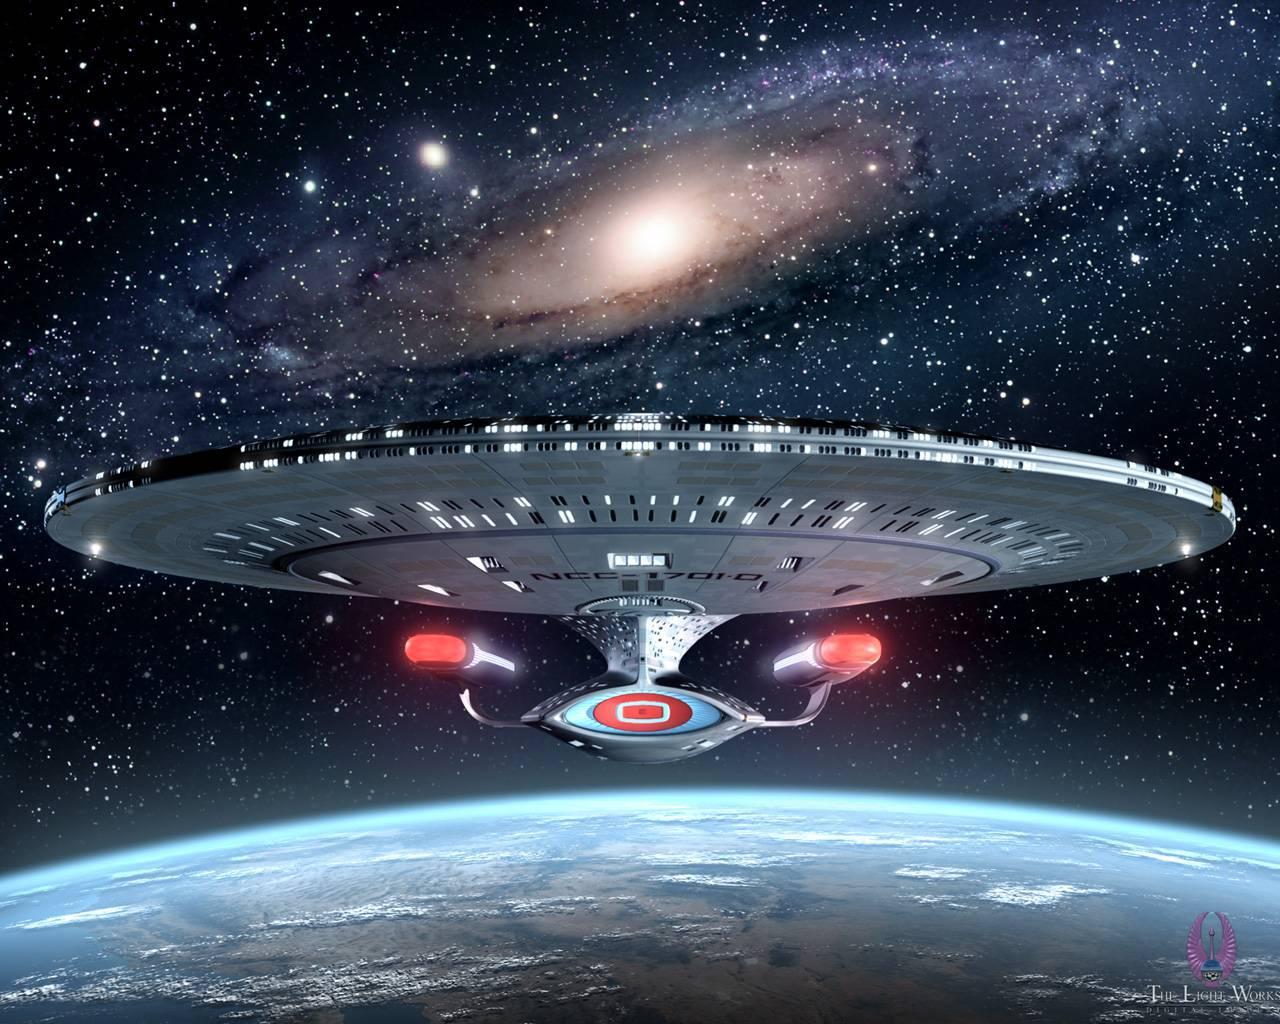 star trek sci fi blog star trek questions and answers star trek questions and answers